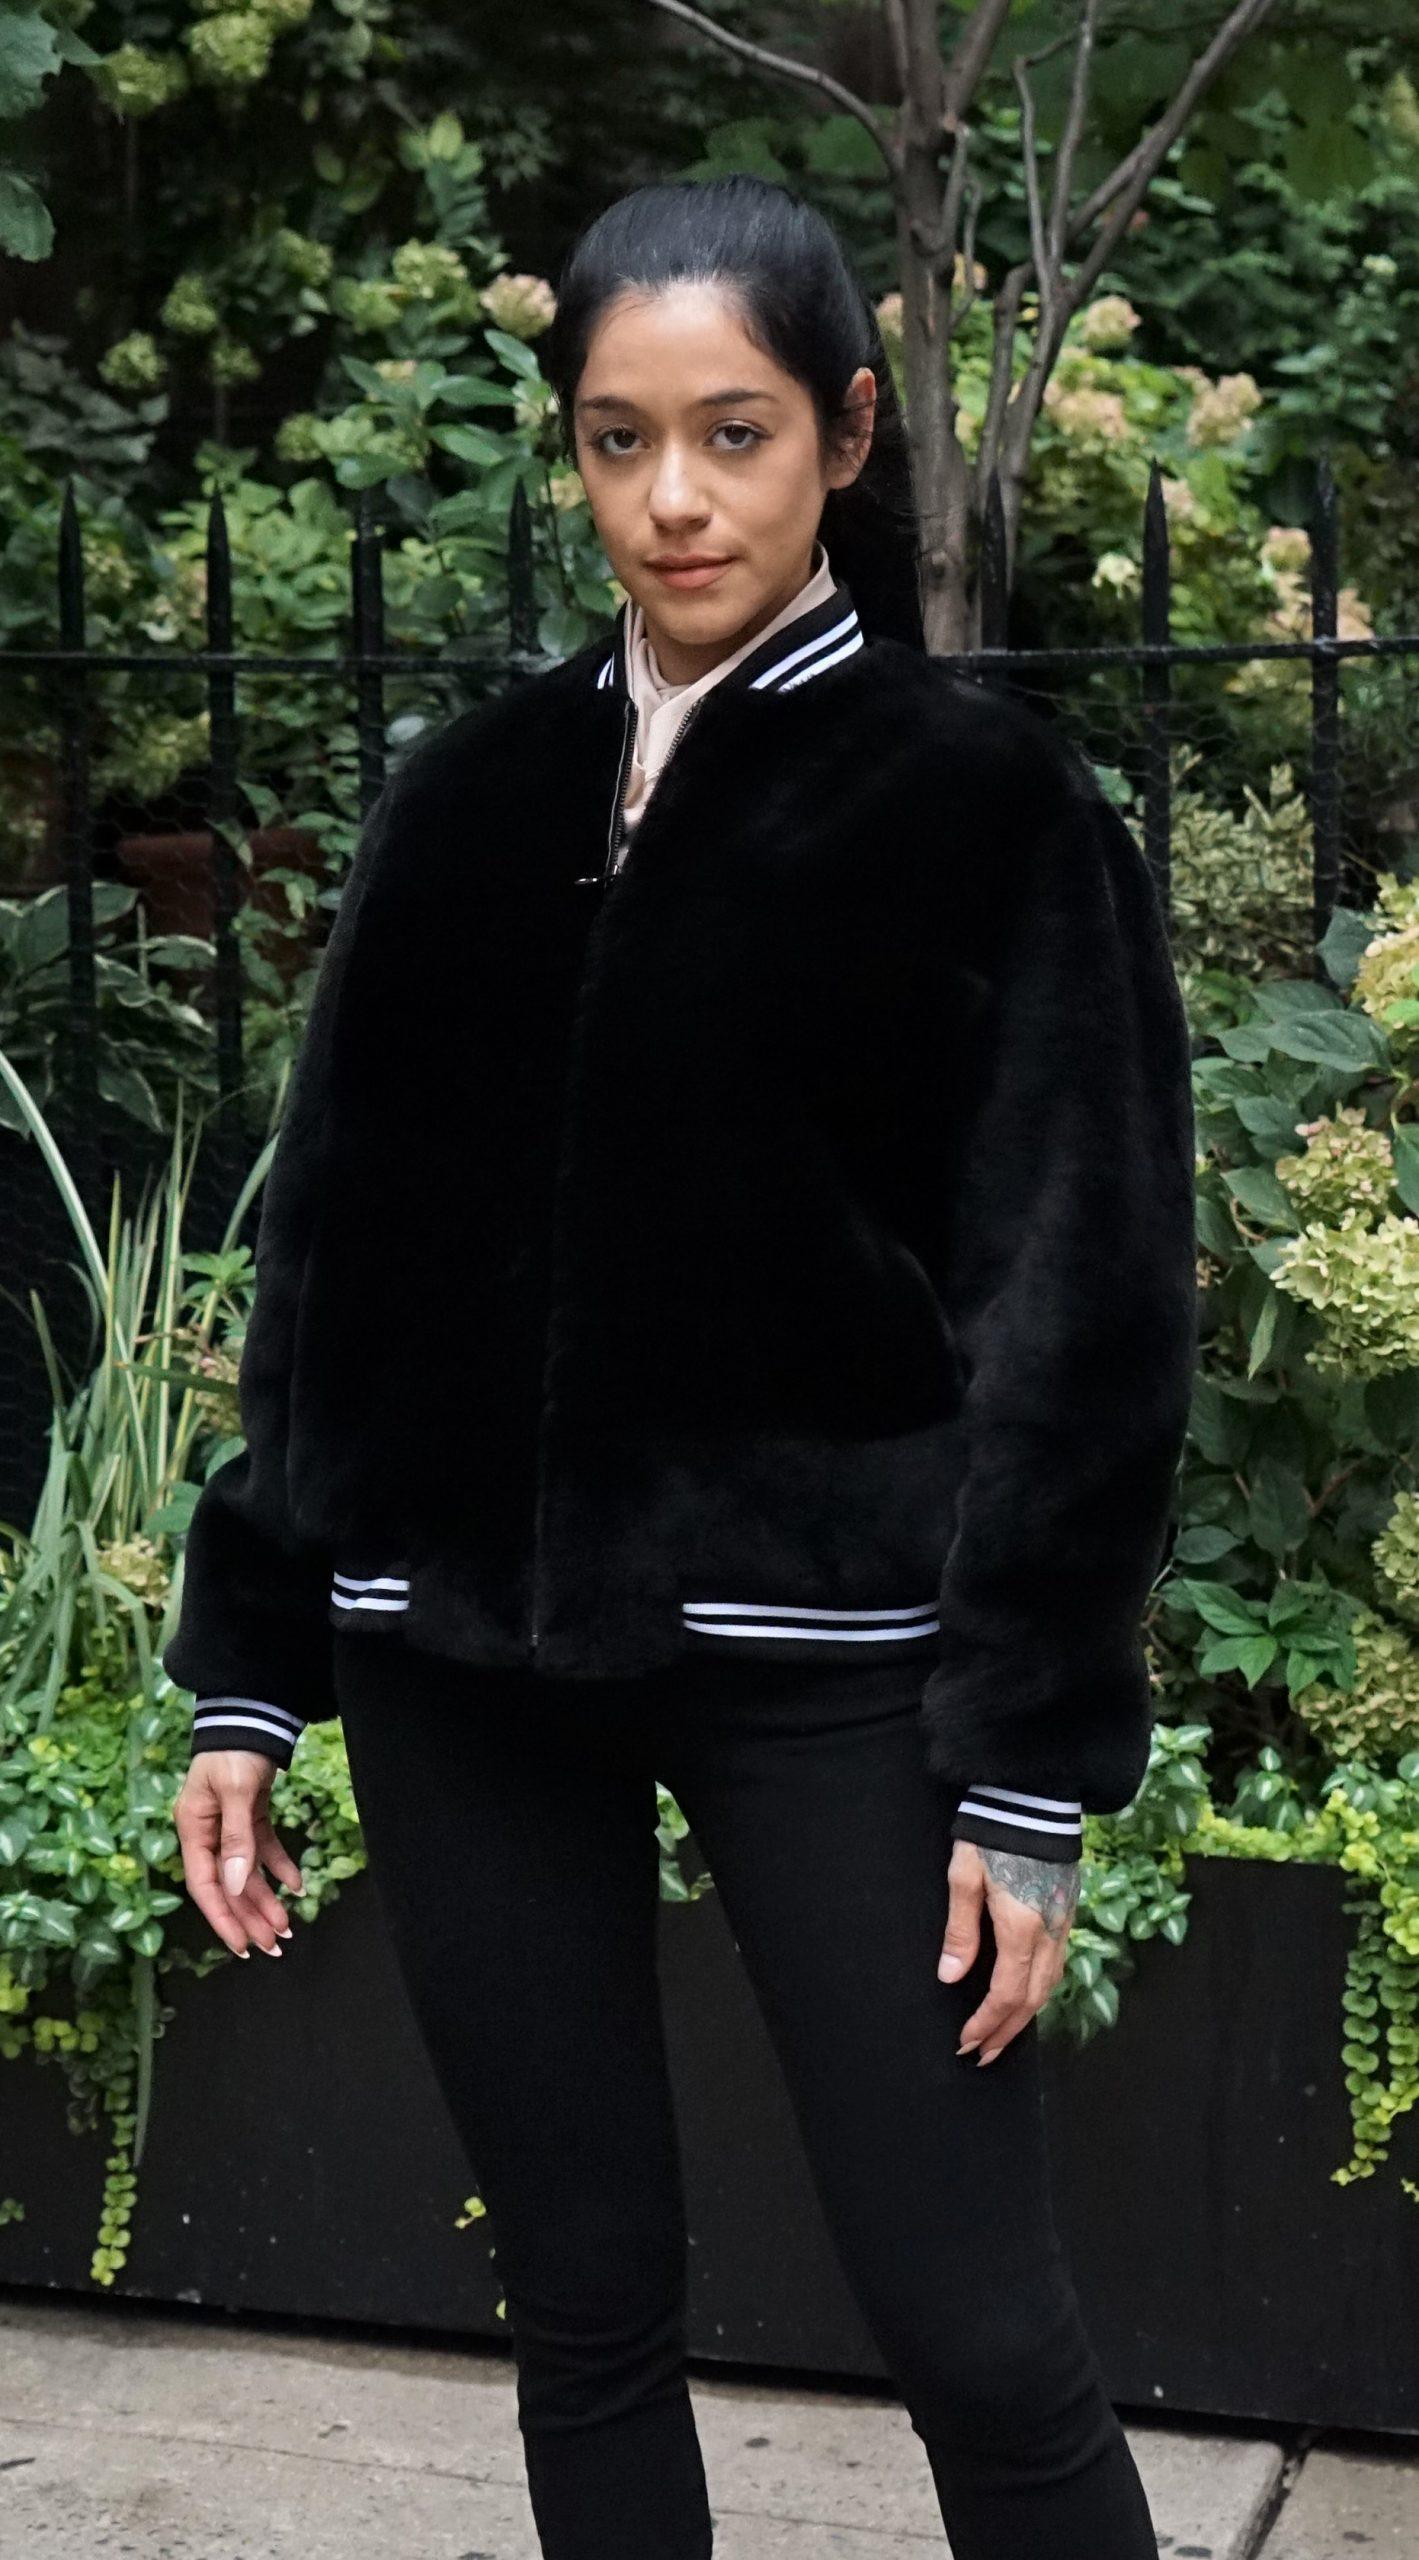 Designer Shearling Jacket for Women